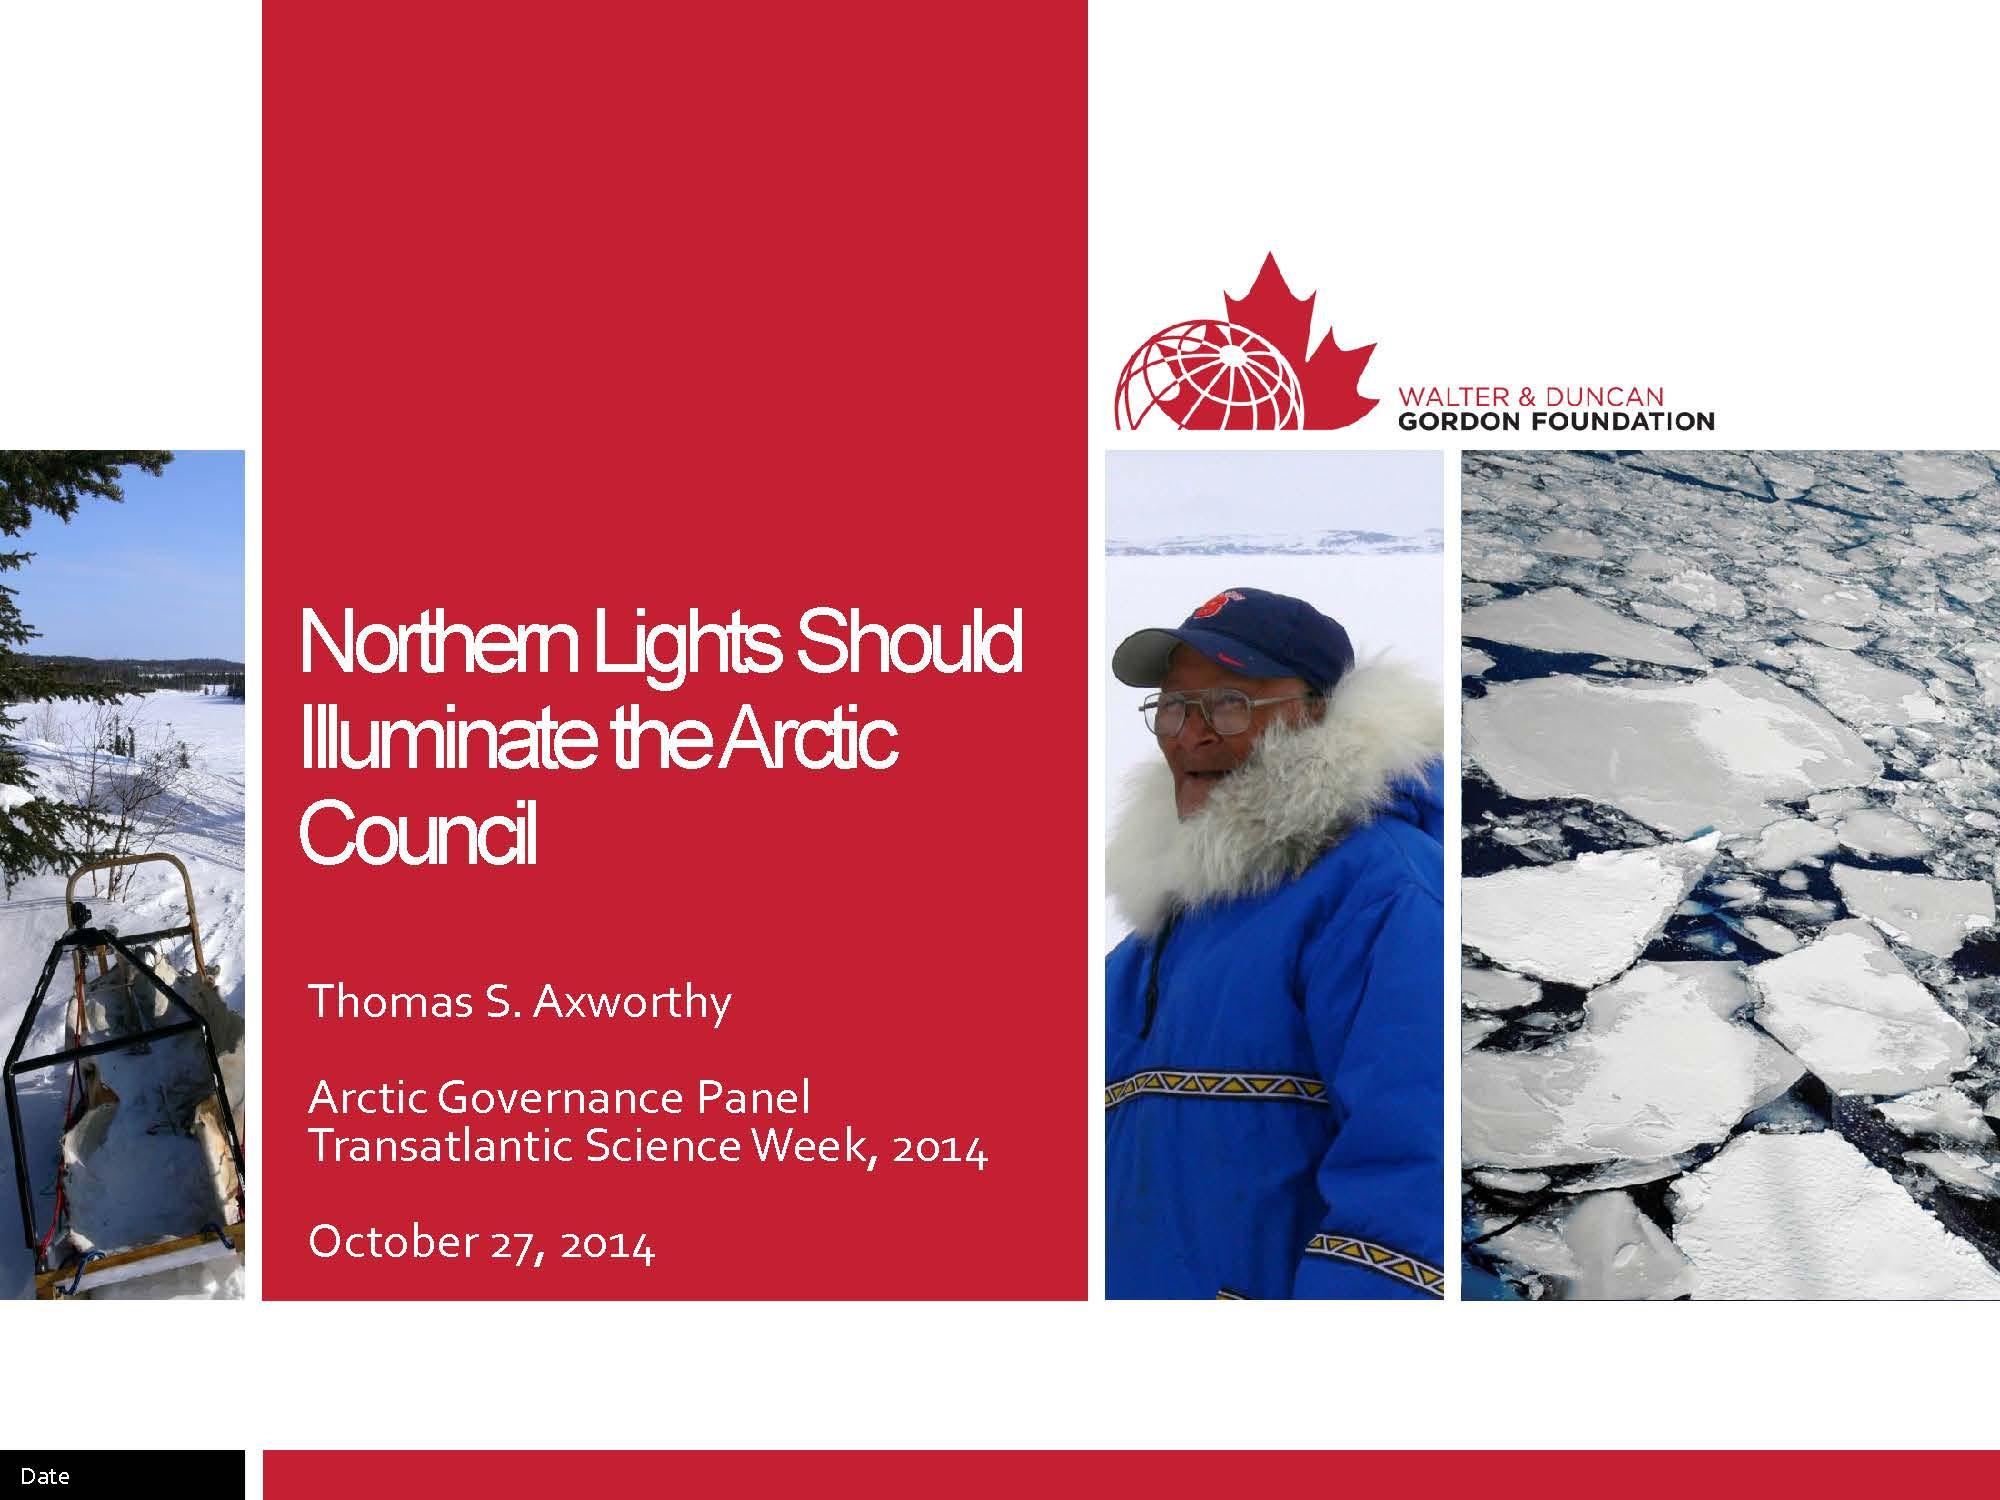 2014_Axworthy_NorthernLightsIlluminateArctic_COVERONLY